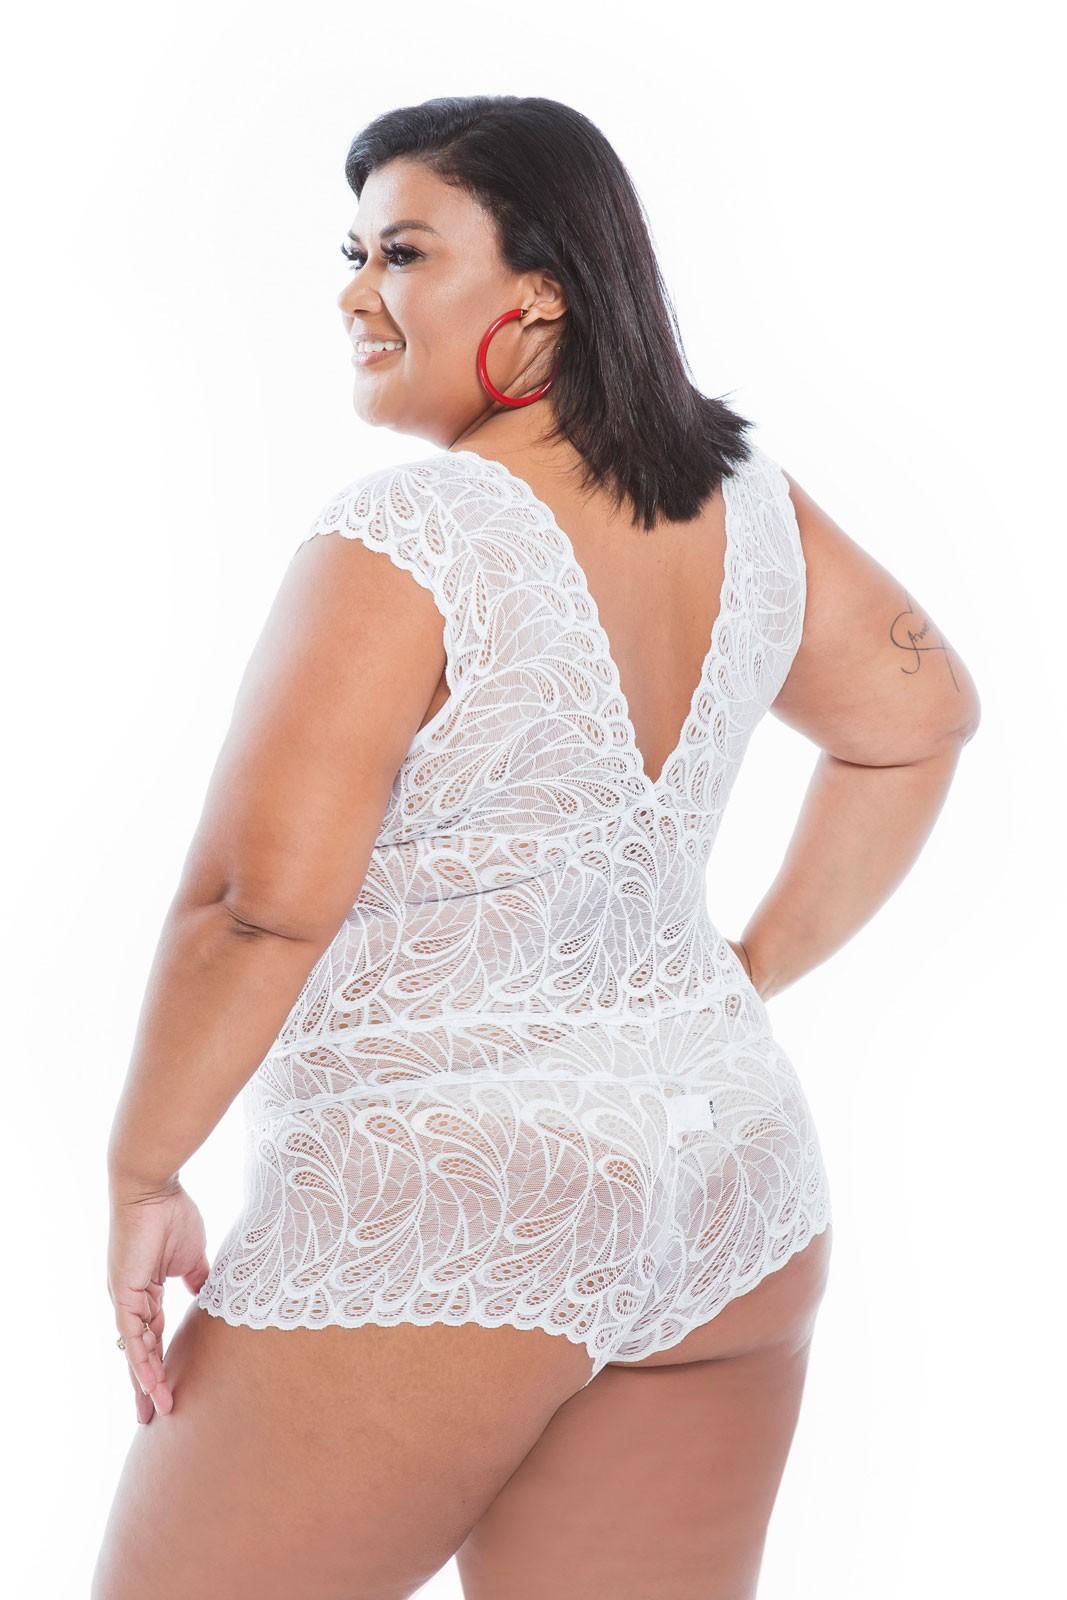 Macaquinho Regata Renda Branco  - RMCE BRAZIL